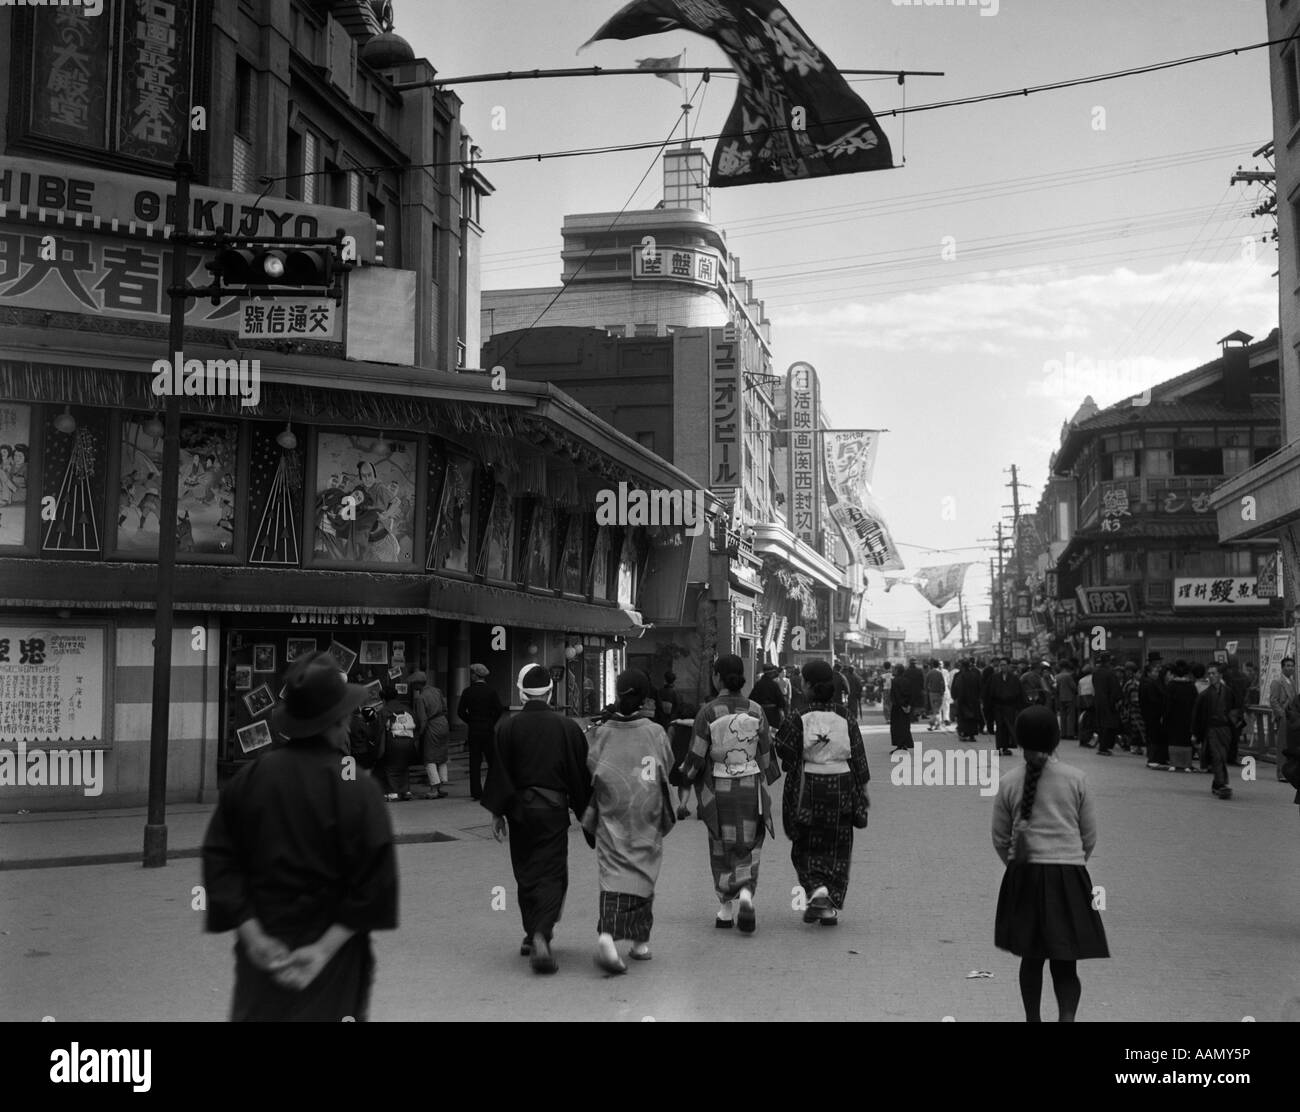 1930s PEOPLE STROLLING STREET SCENE TOKYO THEATER STREET - Stock Image